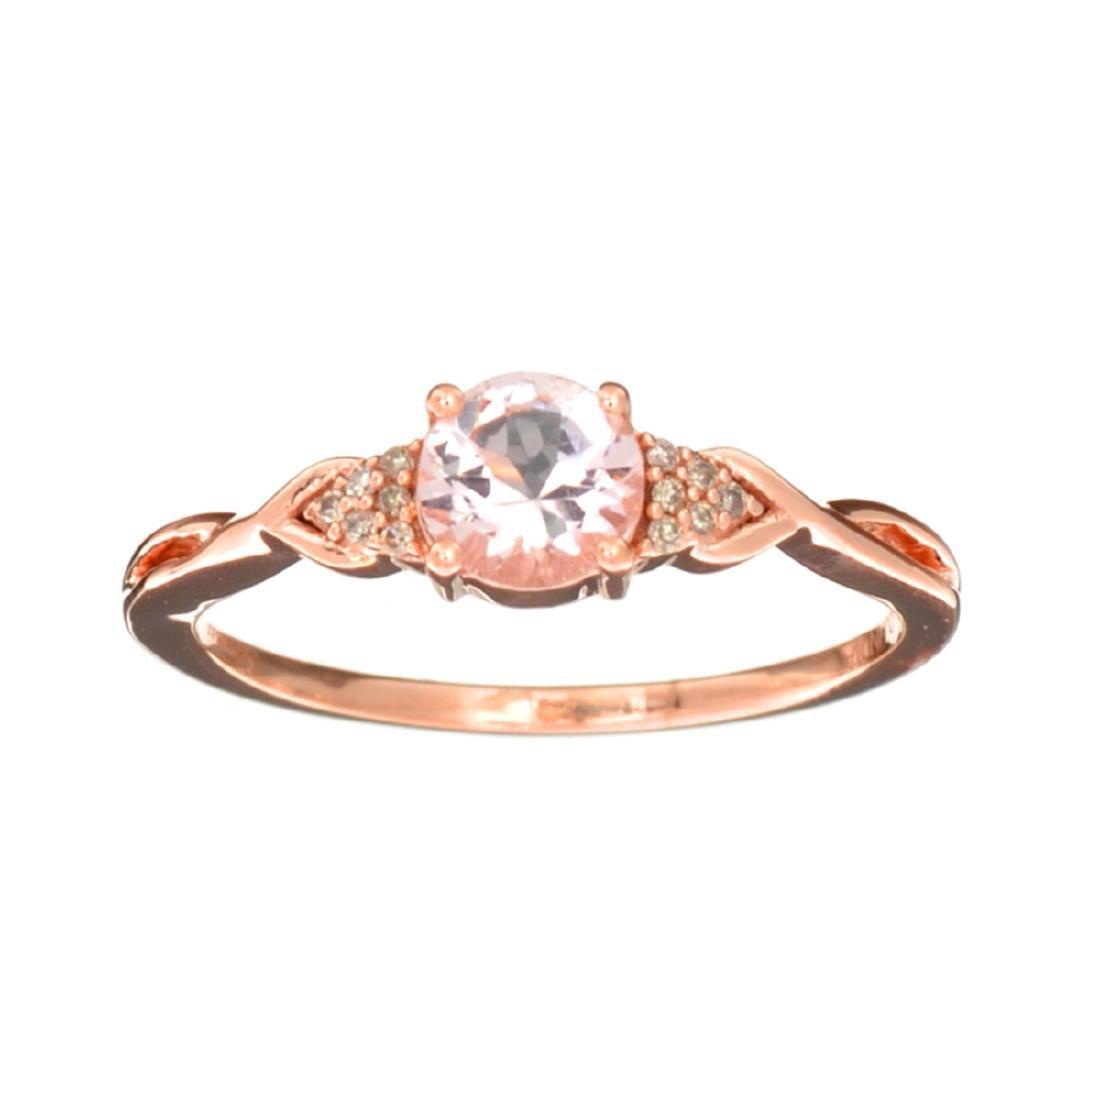 Designer Sebastian 14KT Rose Gold, Round Cut Morganite